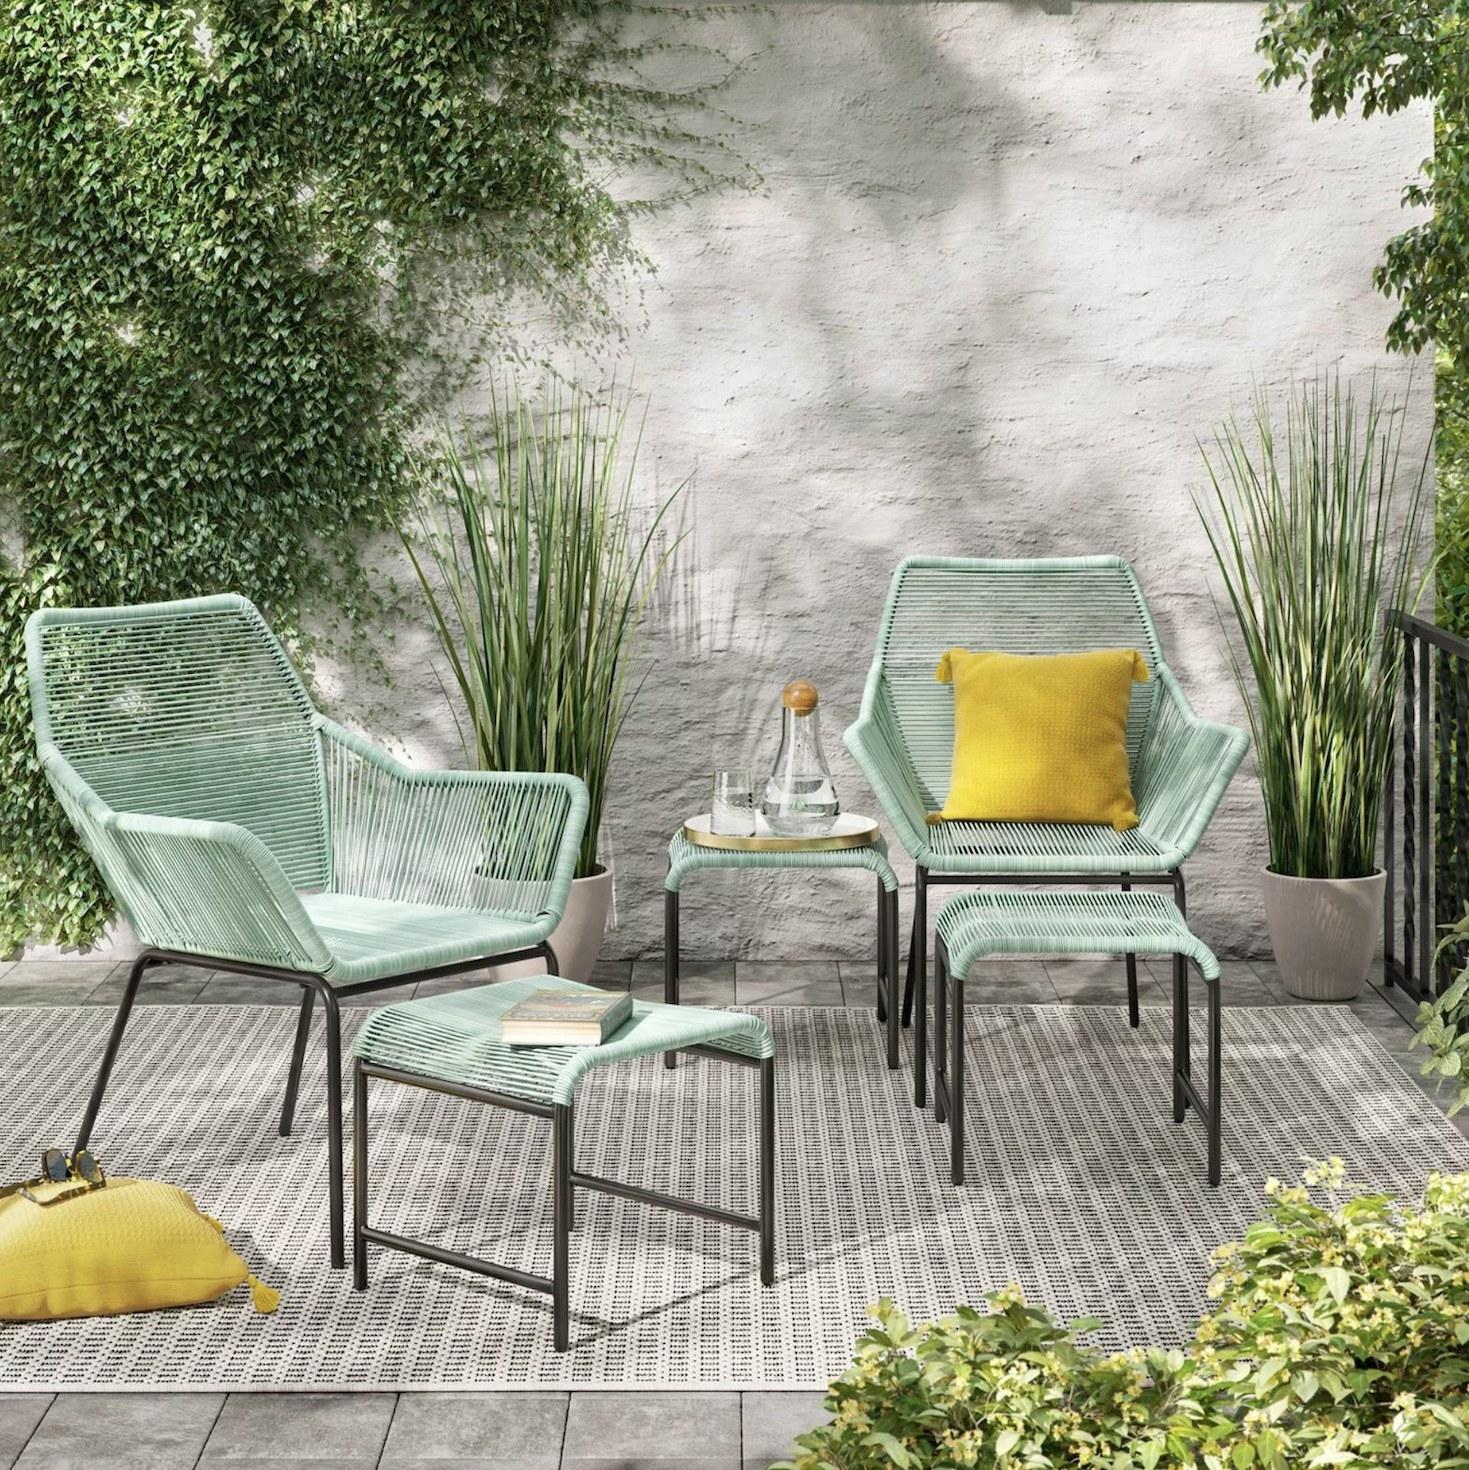 The cute mint green patio set